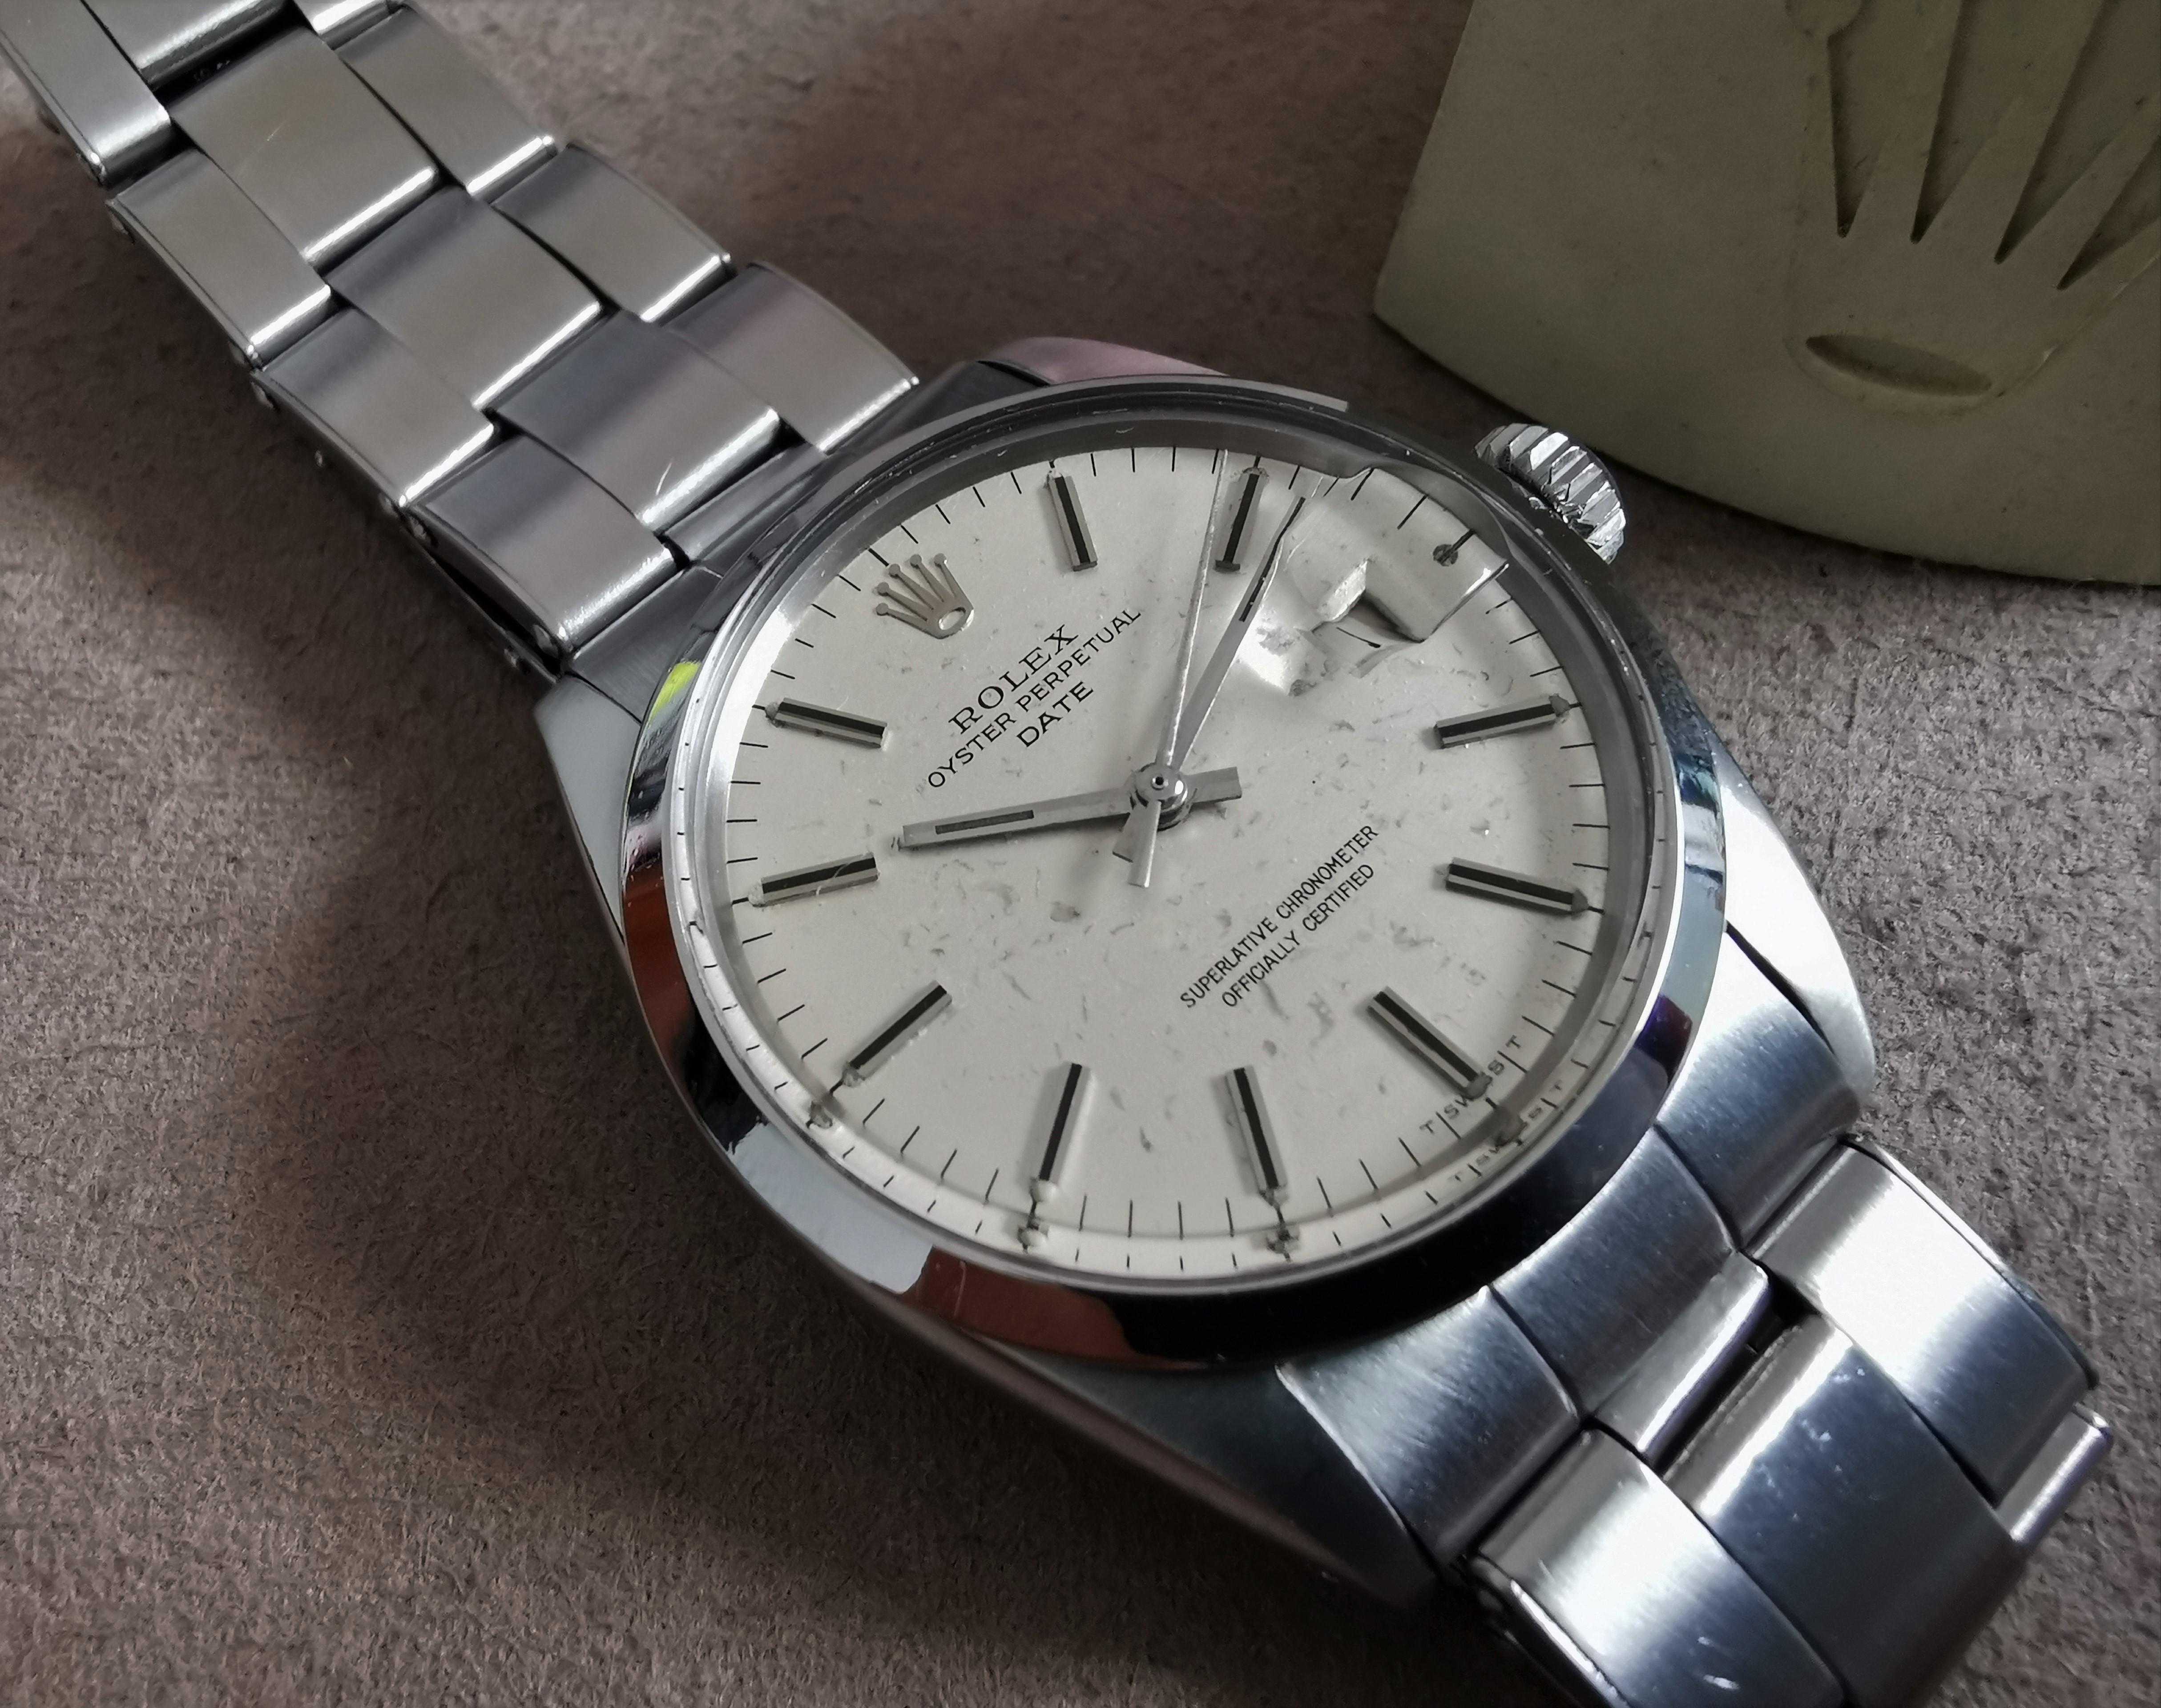 Rolex Oyster Perpetual Date Oyster Perpetual Date silver spot dial 1969 caliber 1570 | San Giorgio a Cremano